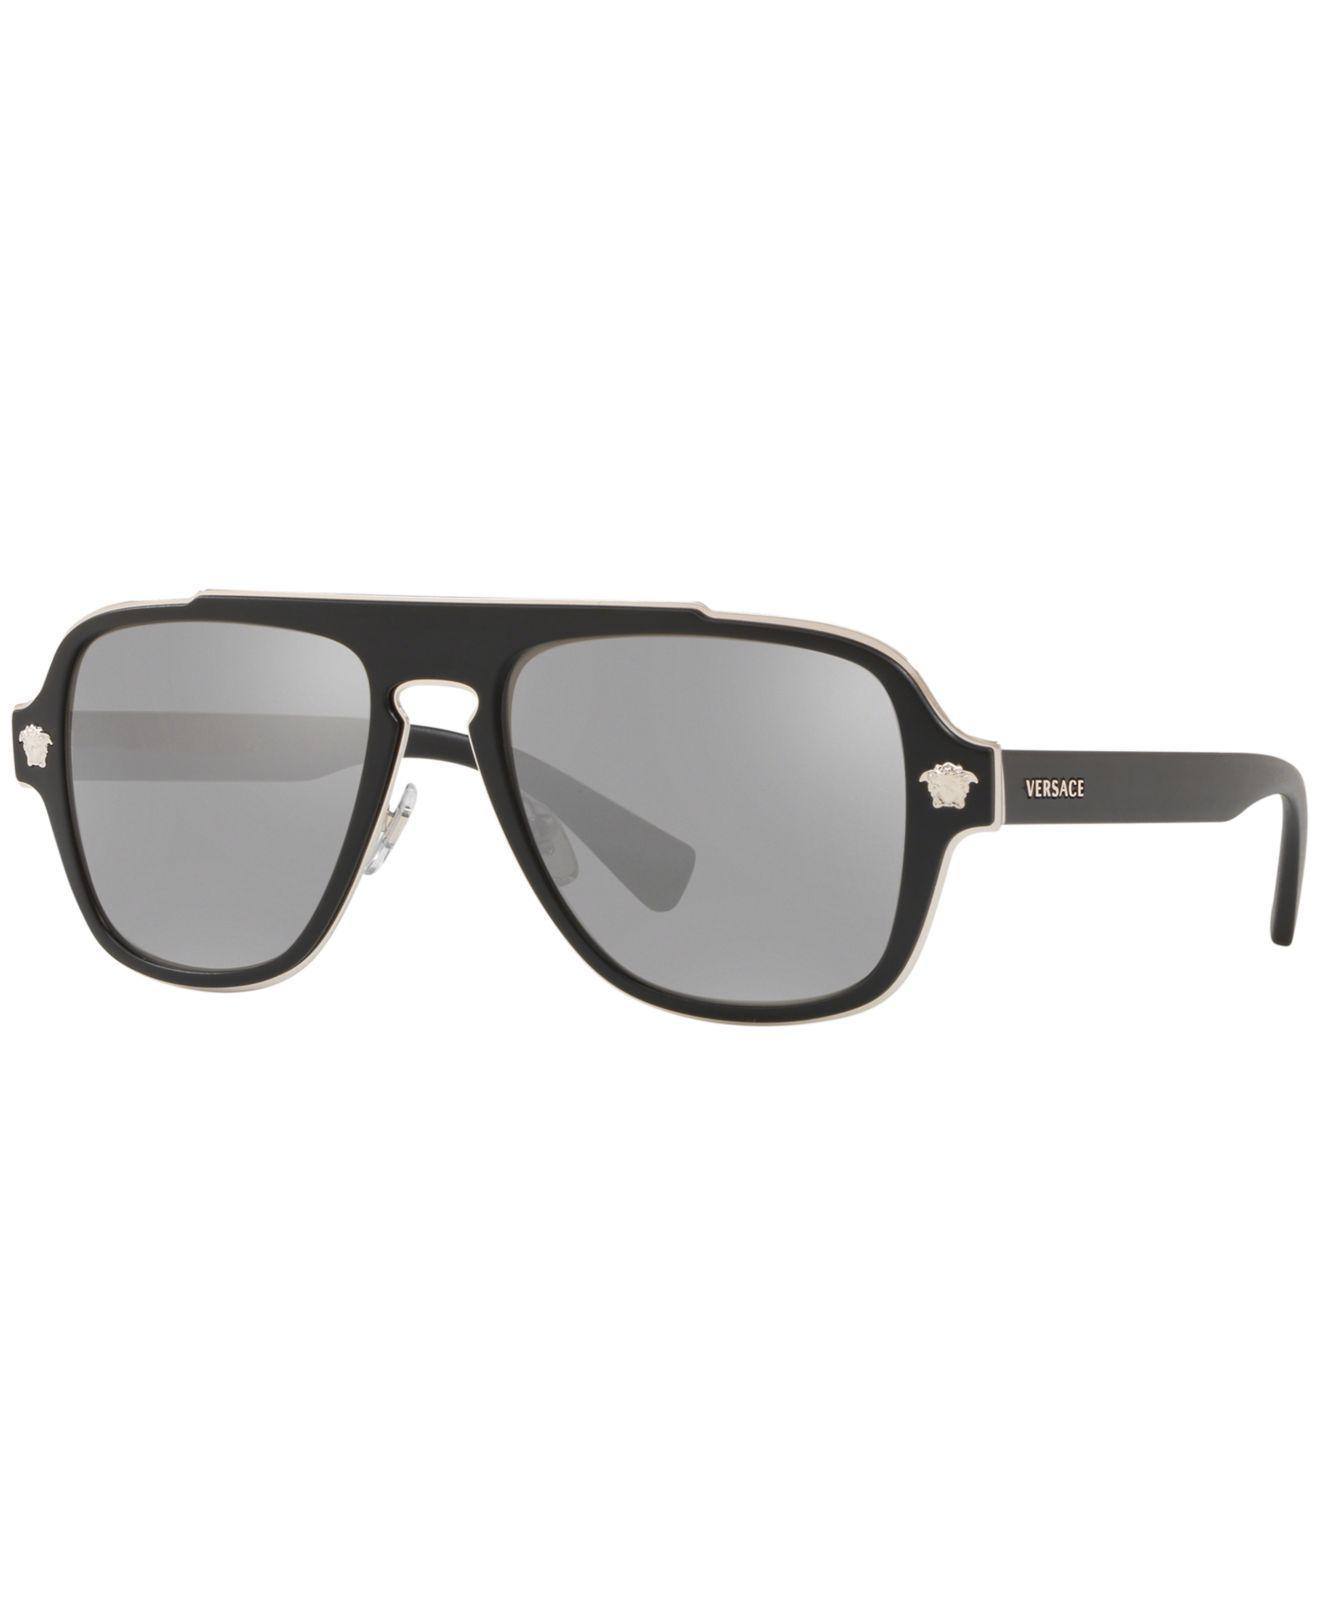 63c0e30961 Lyst - Versace Ve2199 for Men